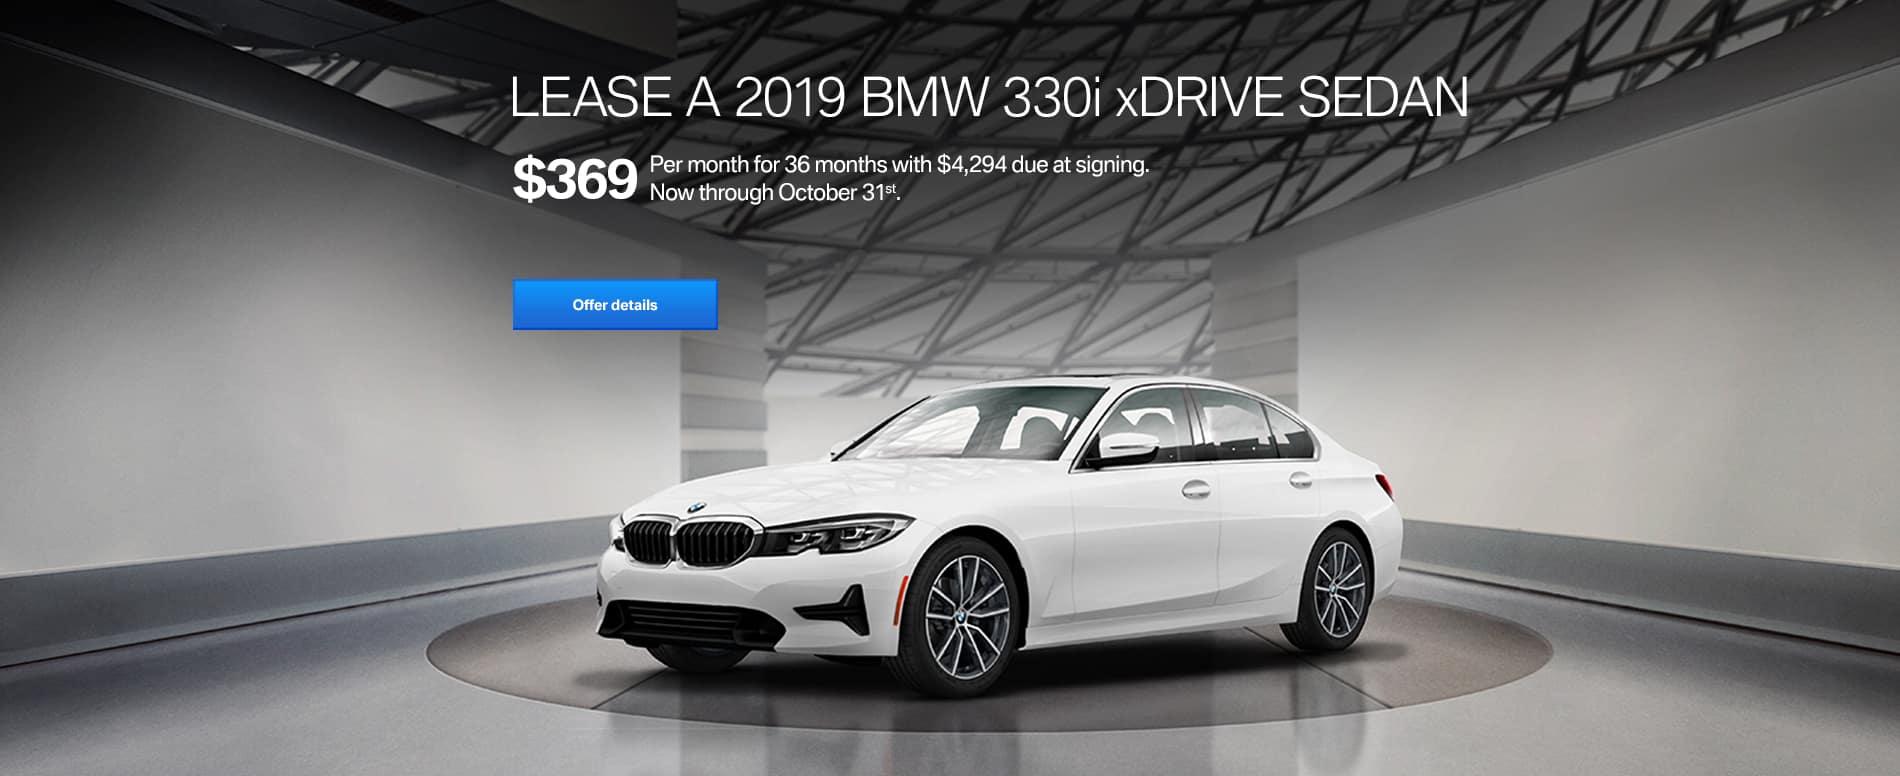 FMA2_OCT_PUSH_BMW_330i_xDrive_369